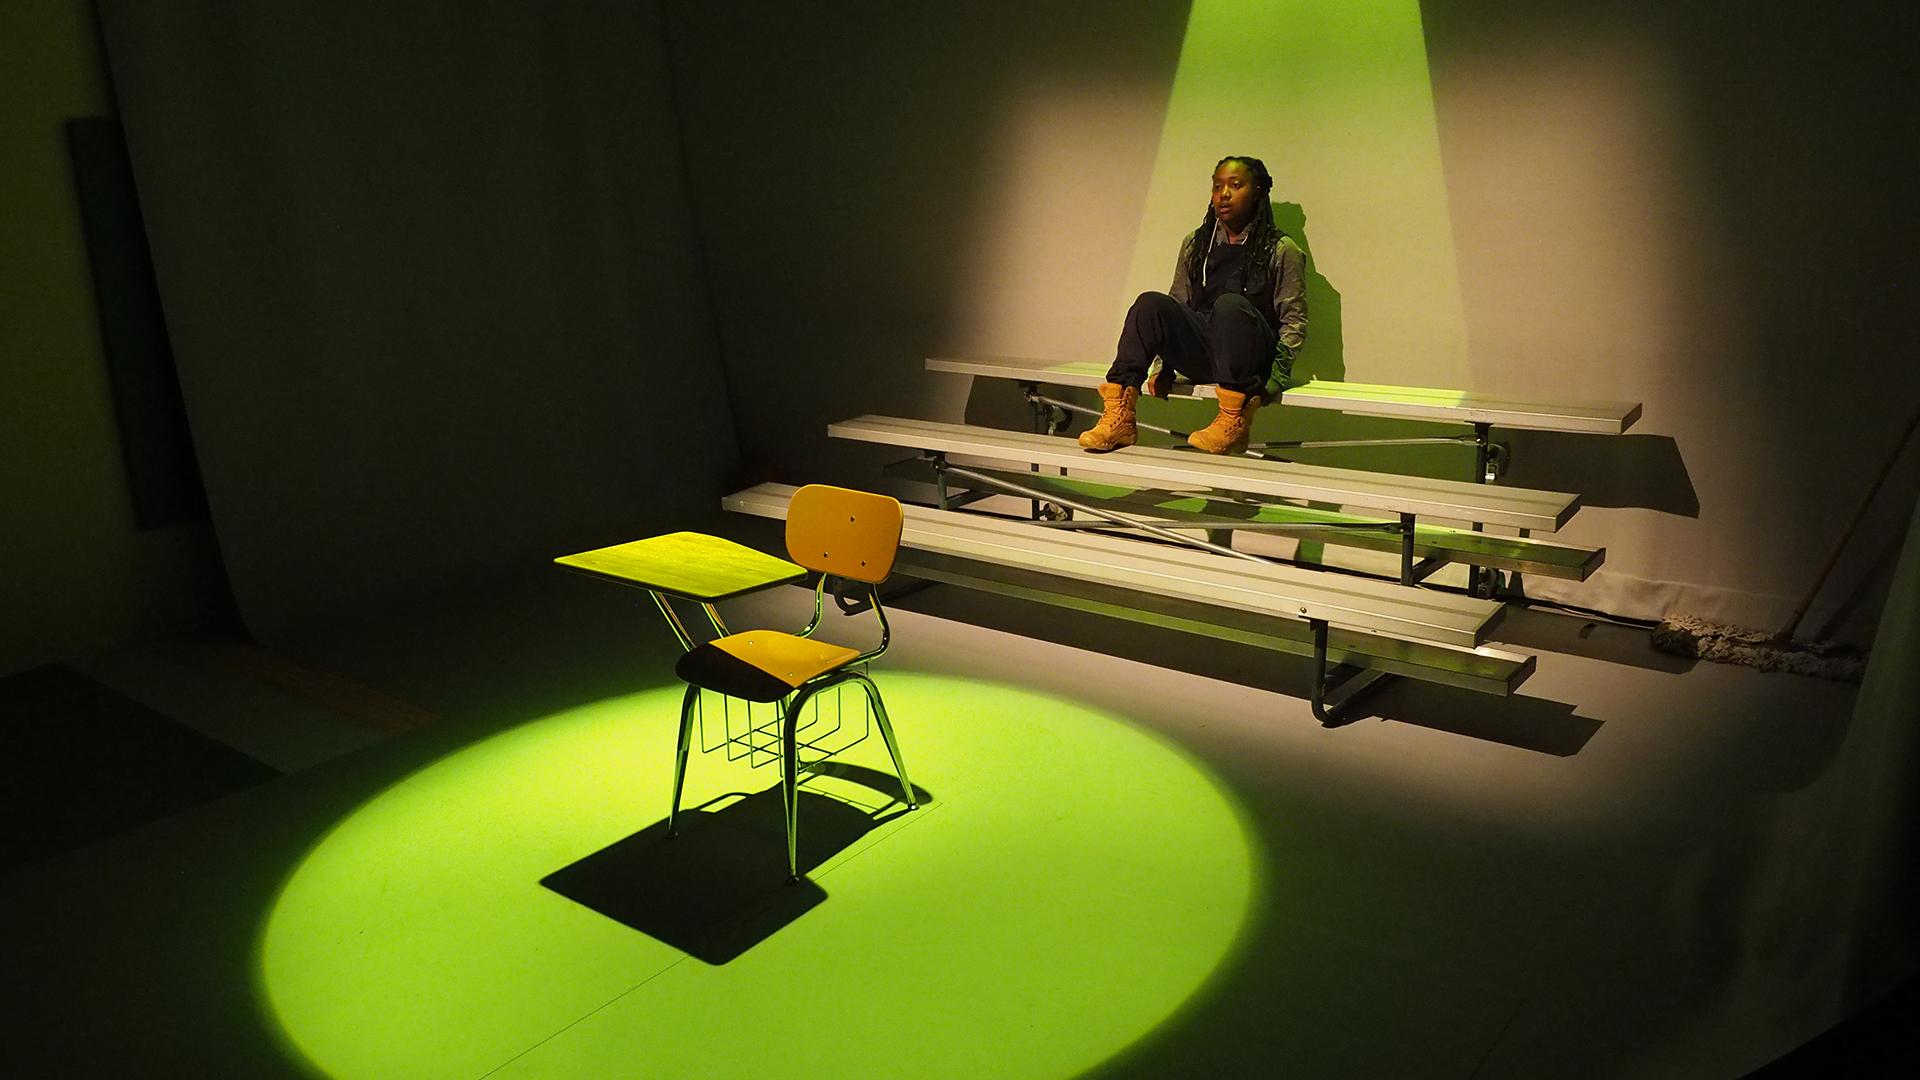 Zhalarina Sanders on the set of The Light